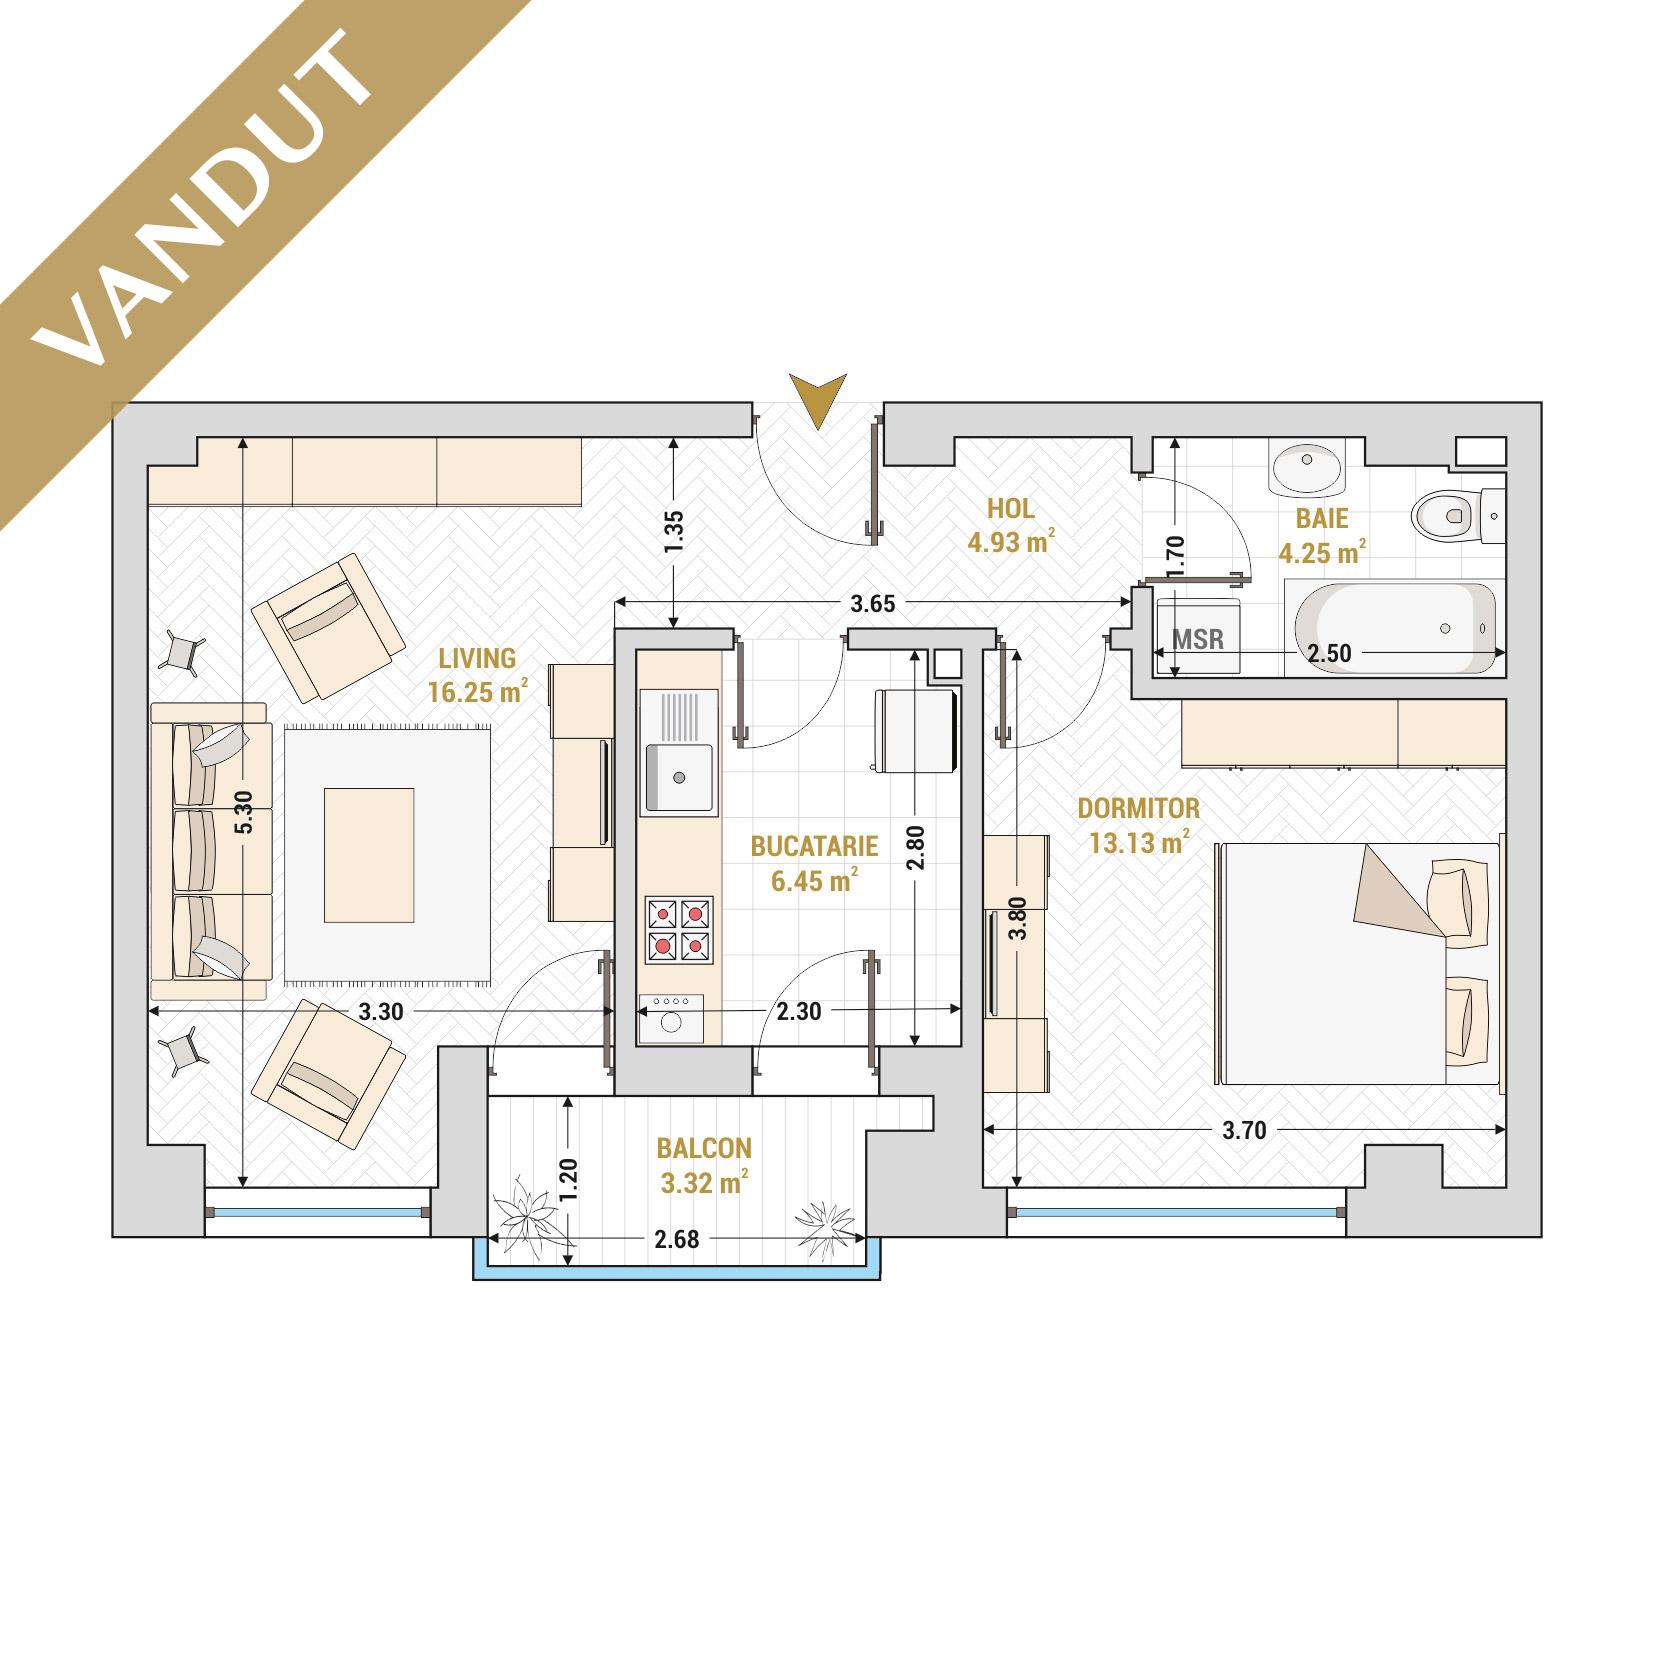 Apartament 2 camere de vanzare Bucuresti - Catedral Residence - Marriott, Piata Unirii, 13 Septembrie, Izvor - Tip 2 - T1 - V